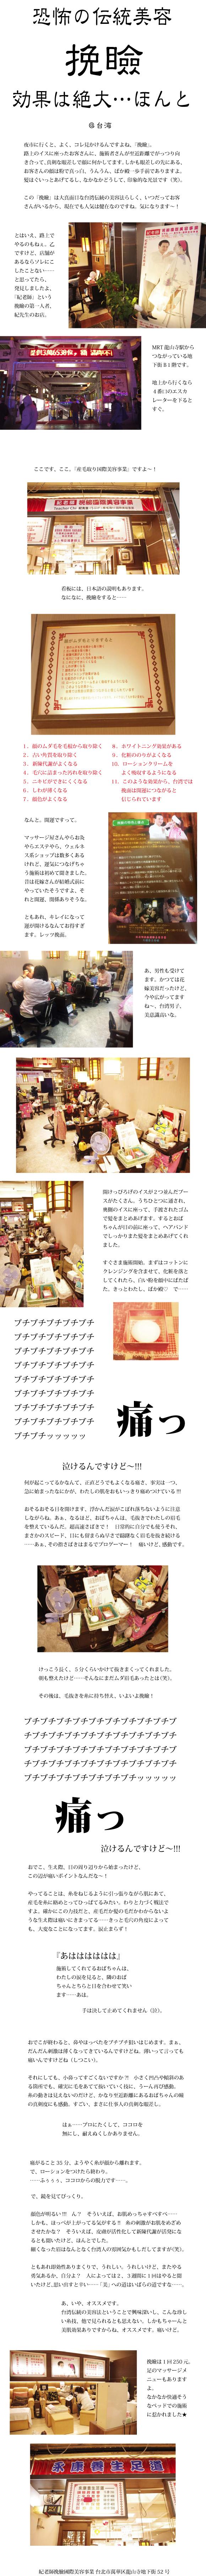 tomako161110.jpg